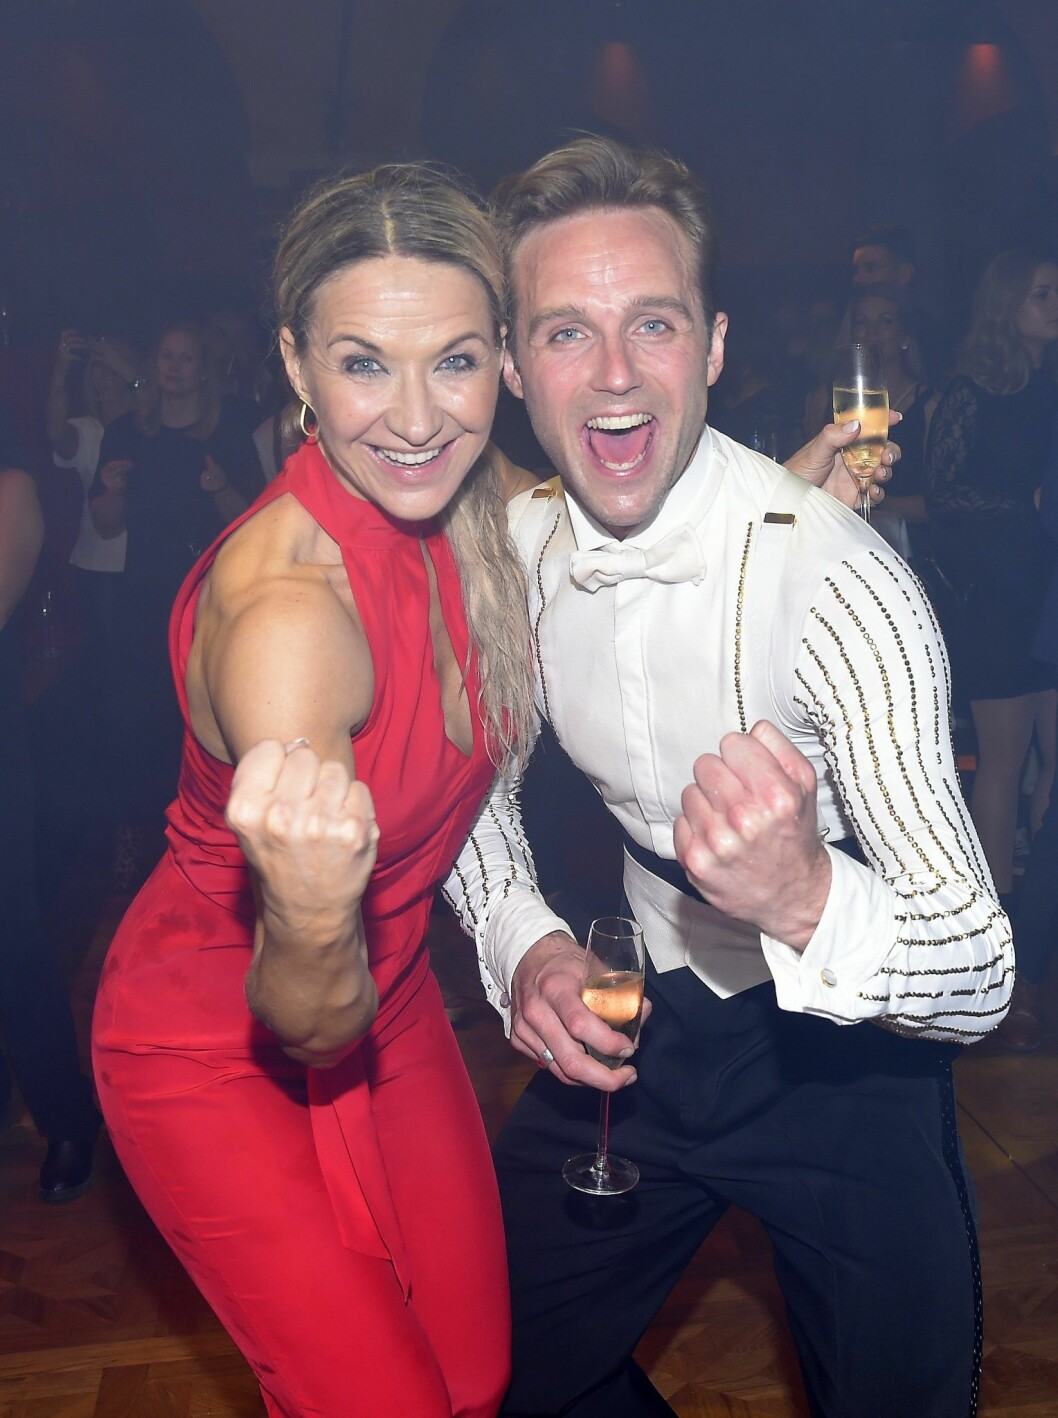 Kristin Kaspersen och dansaren Calle Sterner vann Let's Dance förra året.